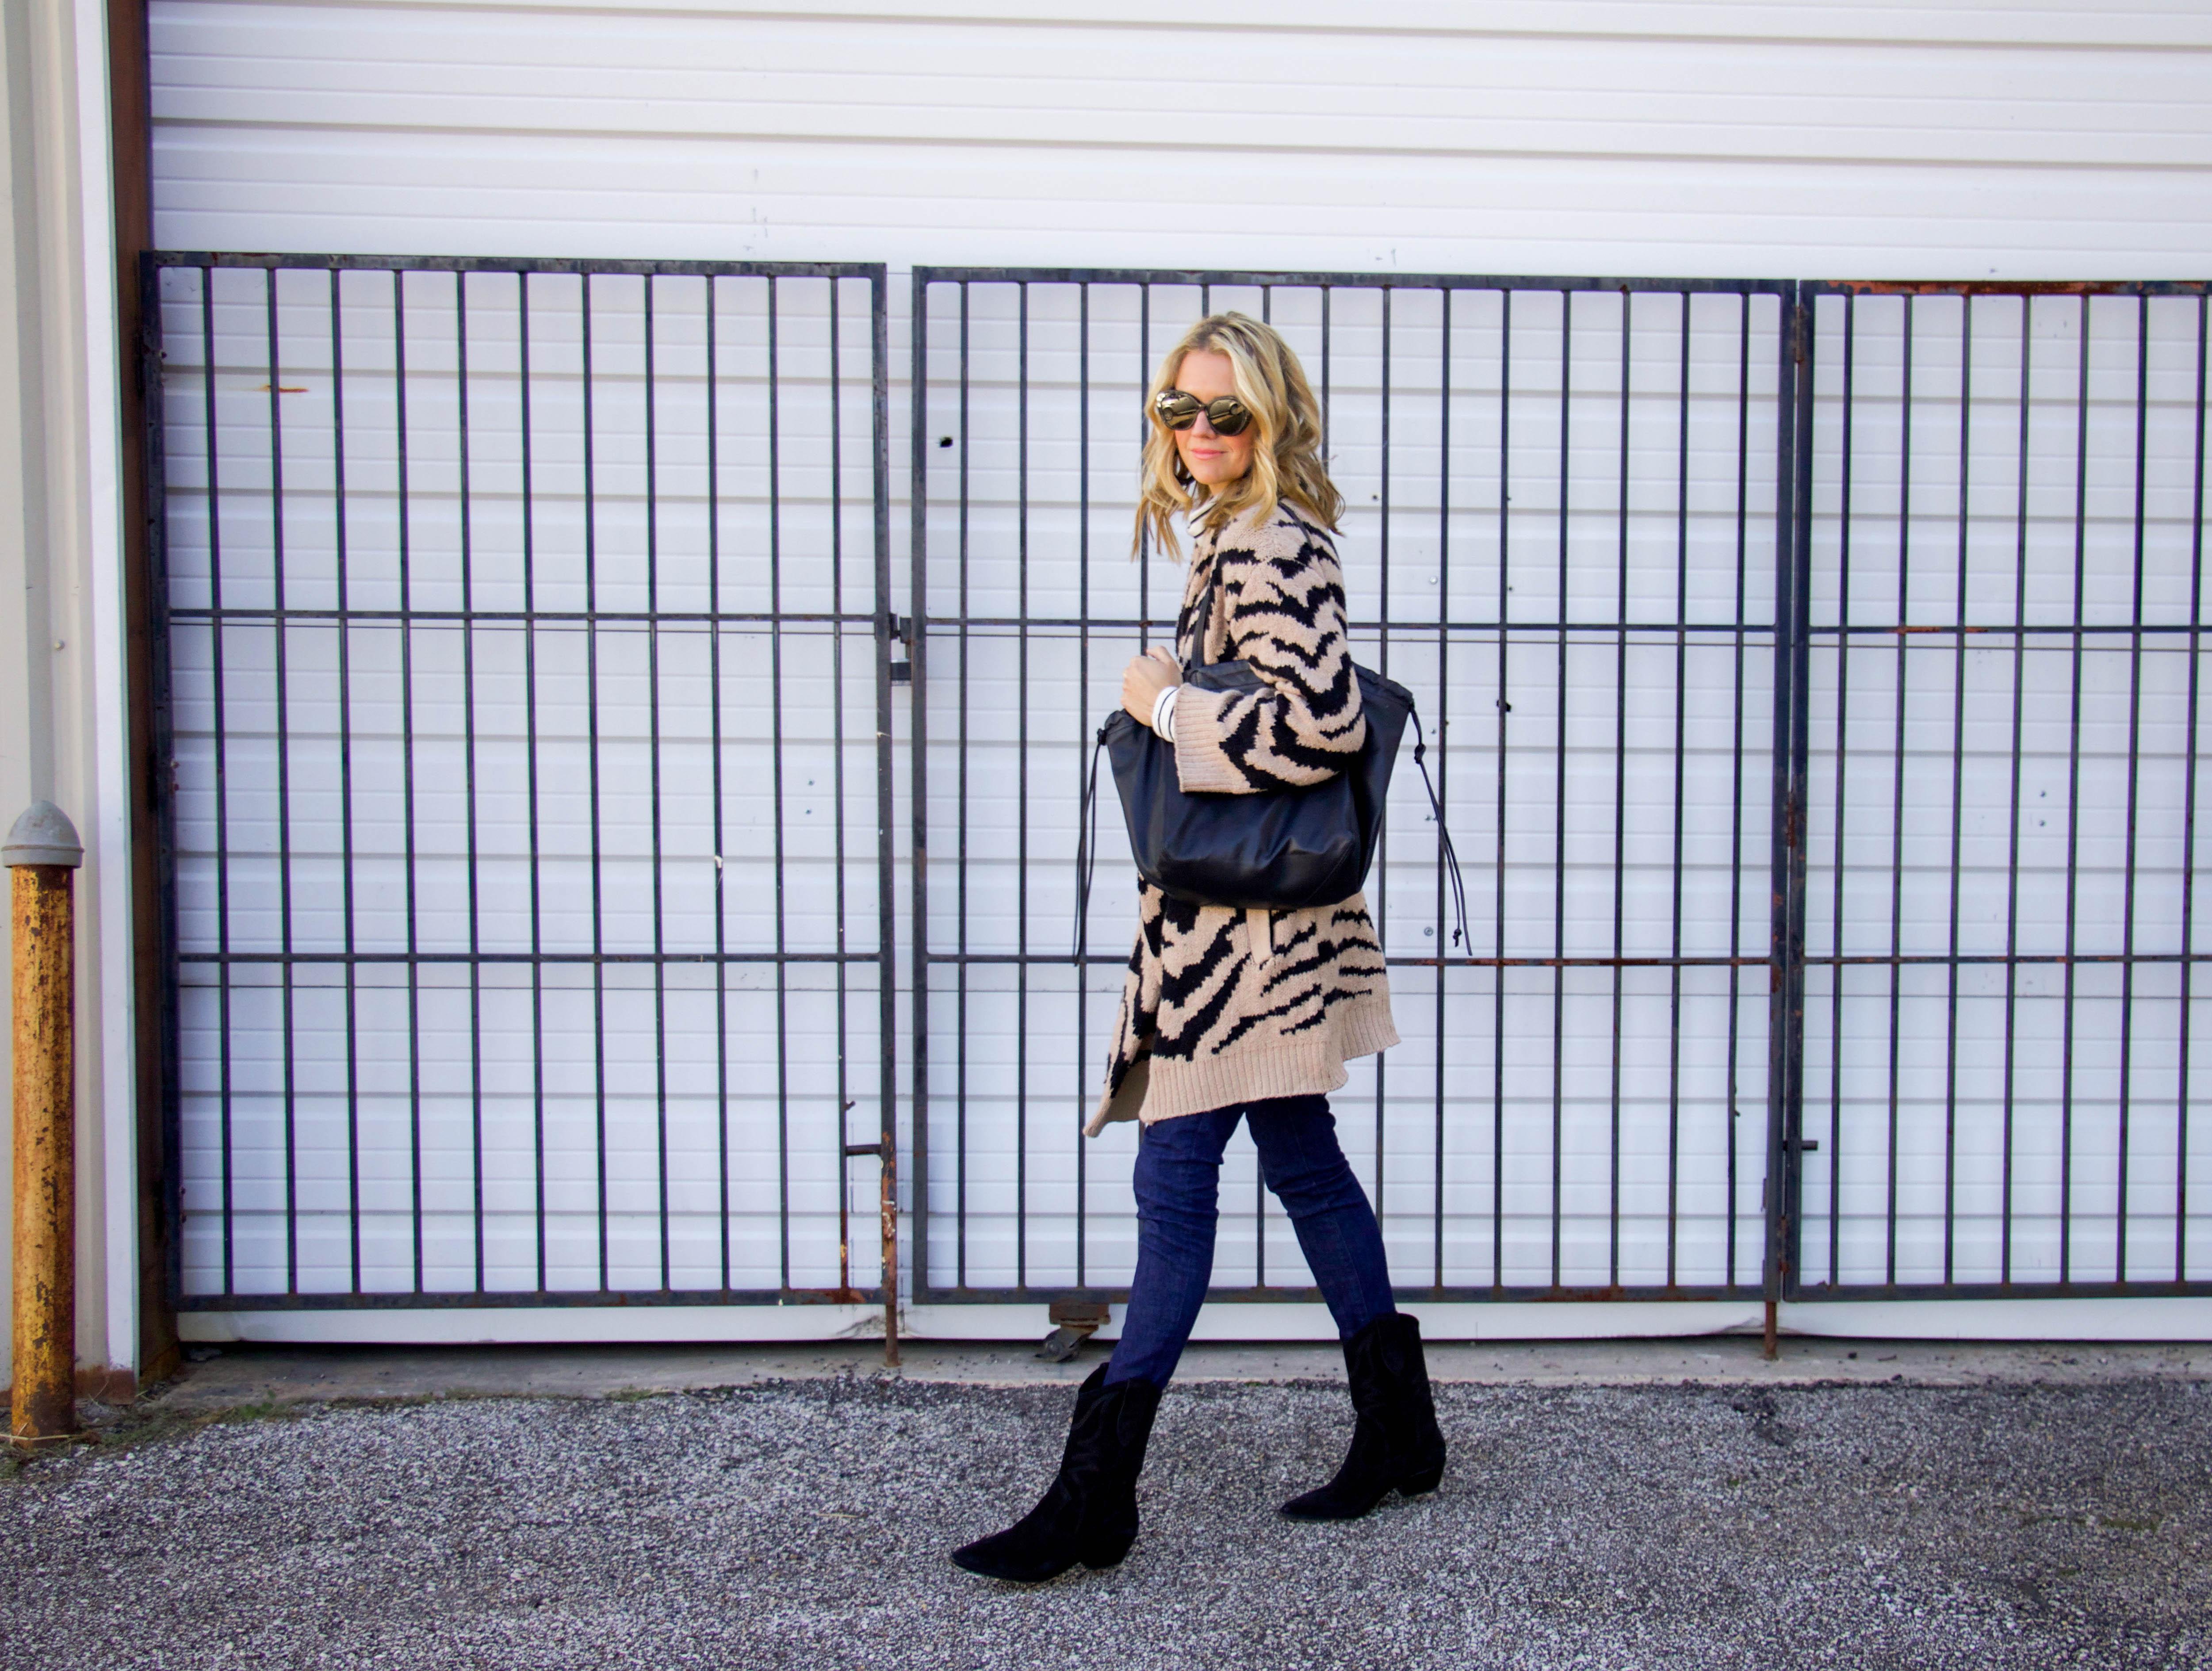 Cupcakes and Cashmere tiger cardigan - J brand denim - Rebecca minkoff booties - Striped turtleneck - tote bag